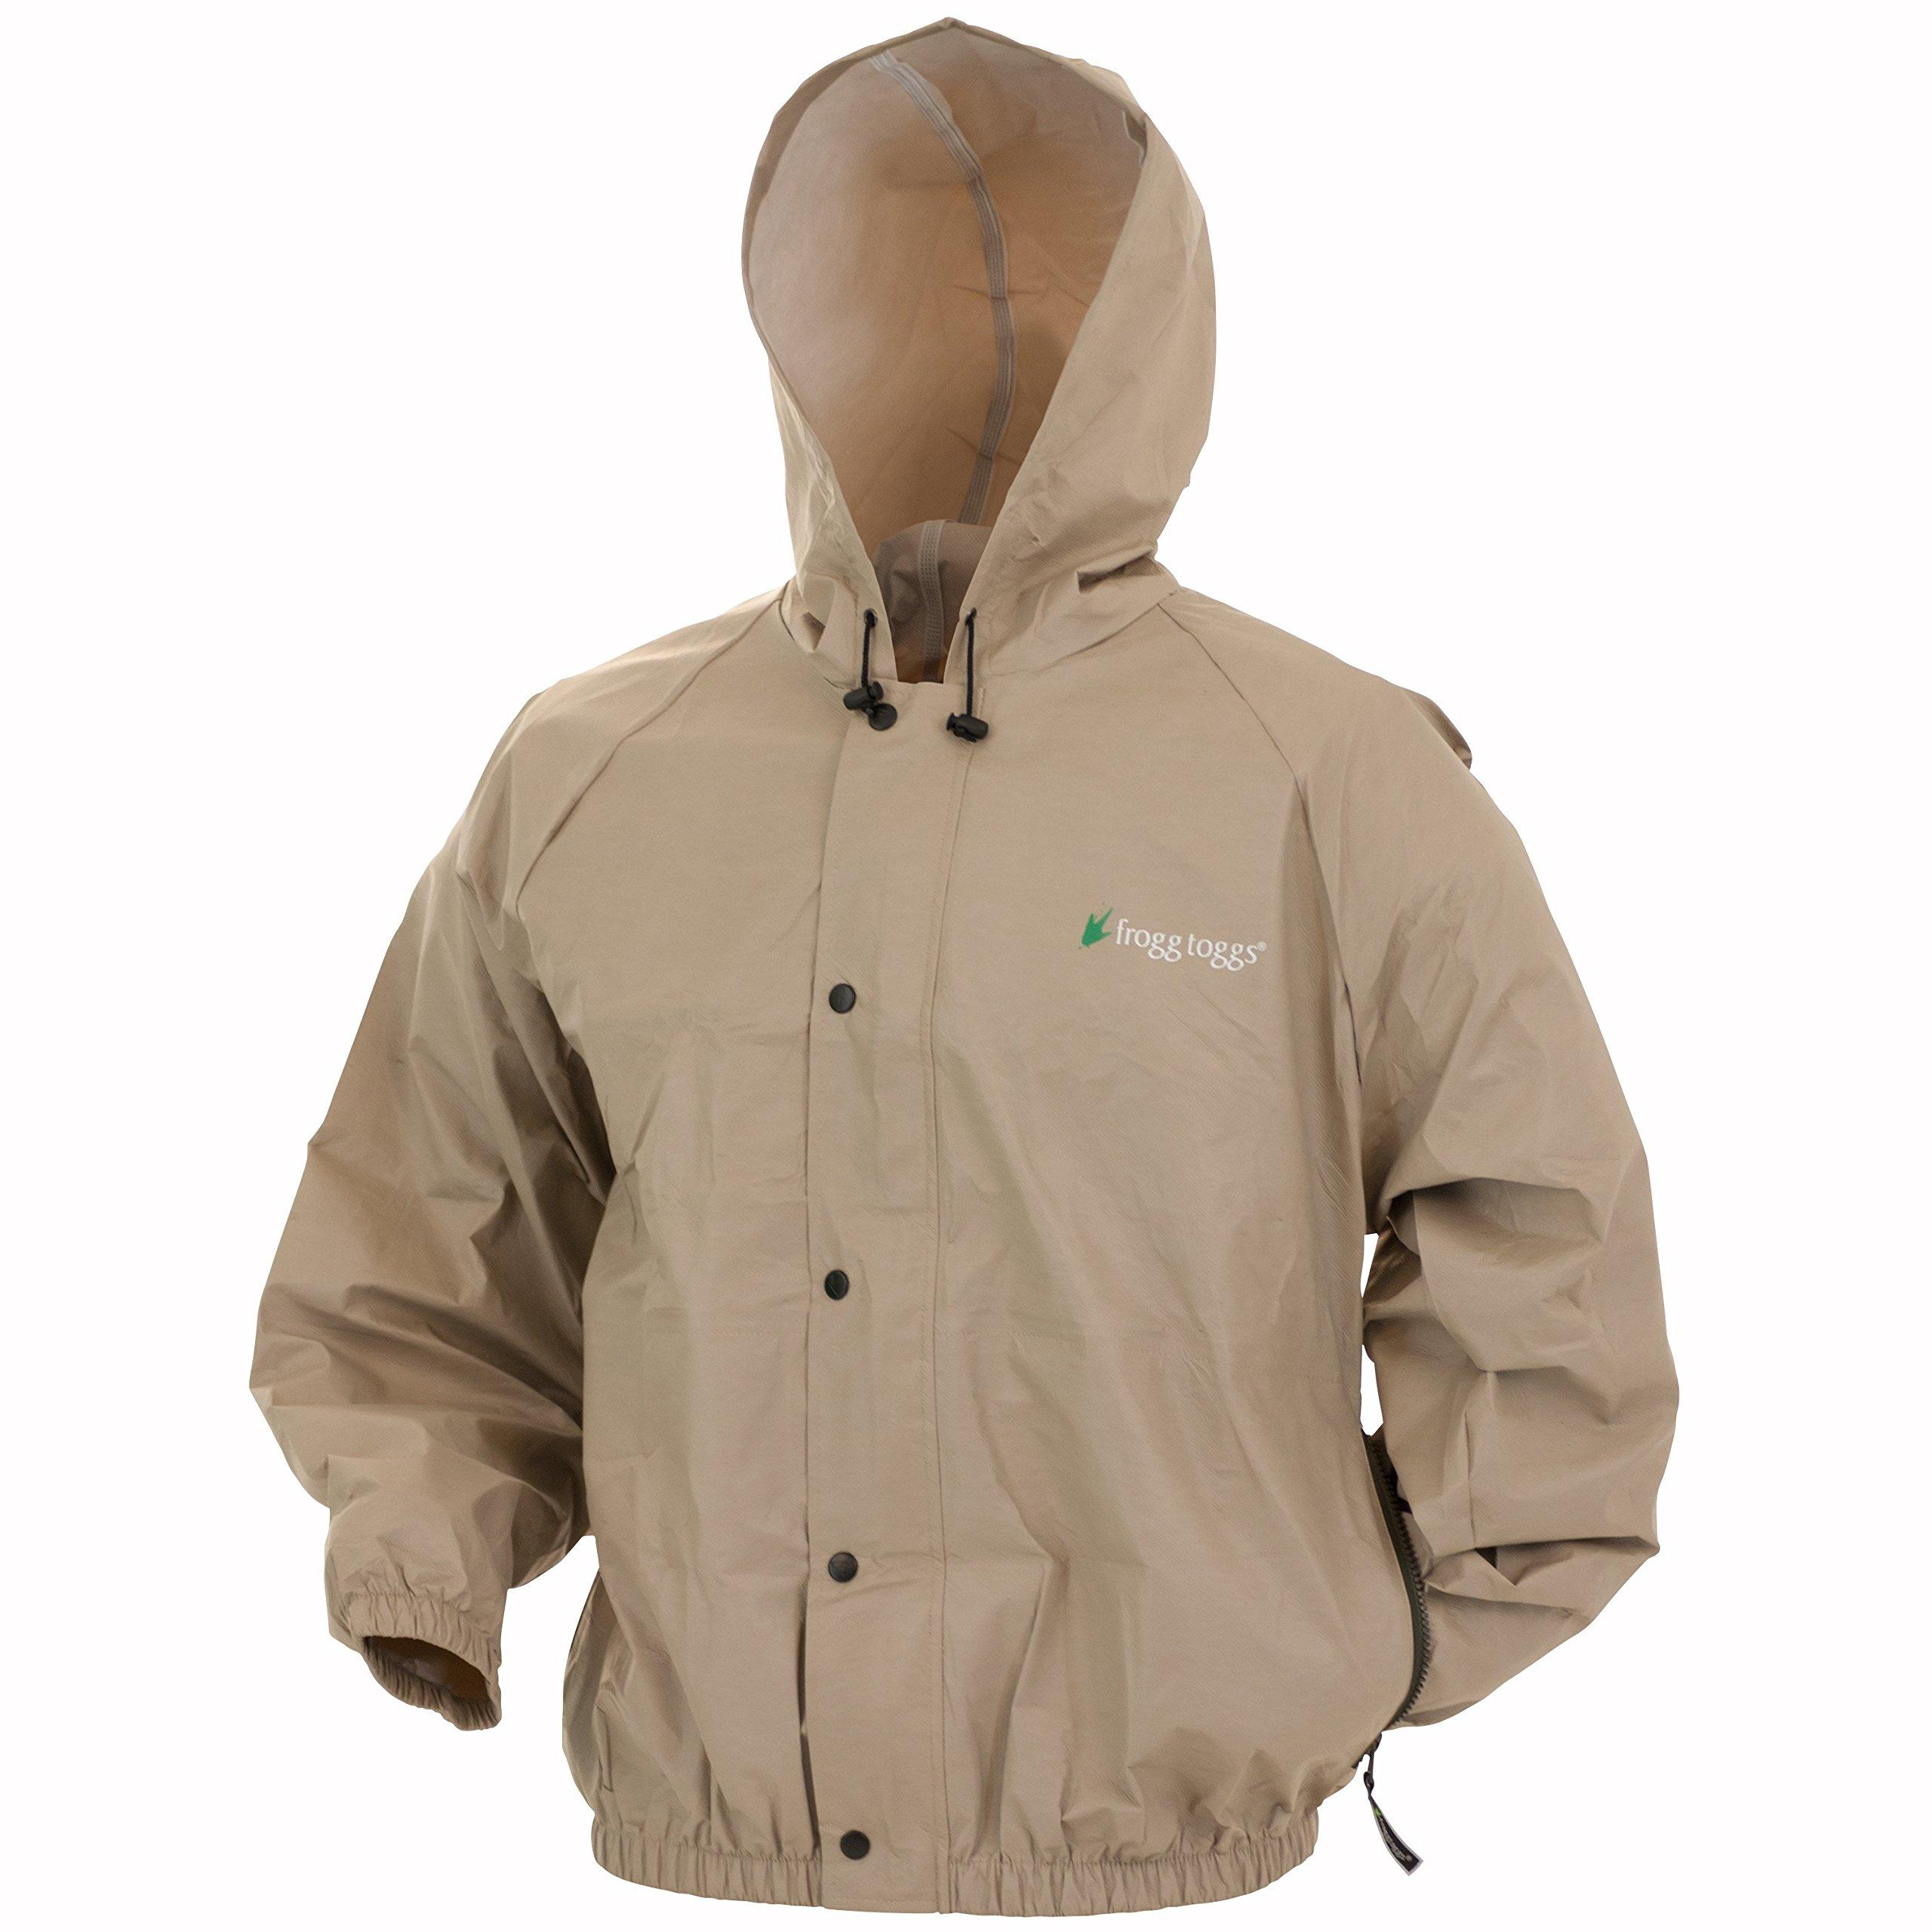 Frogg Toggs PL62111-04 Pro Lite rain jacket Khaki XL/XXL